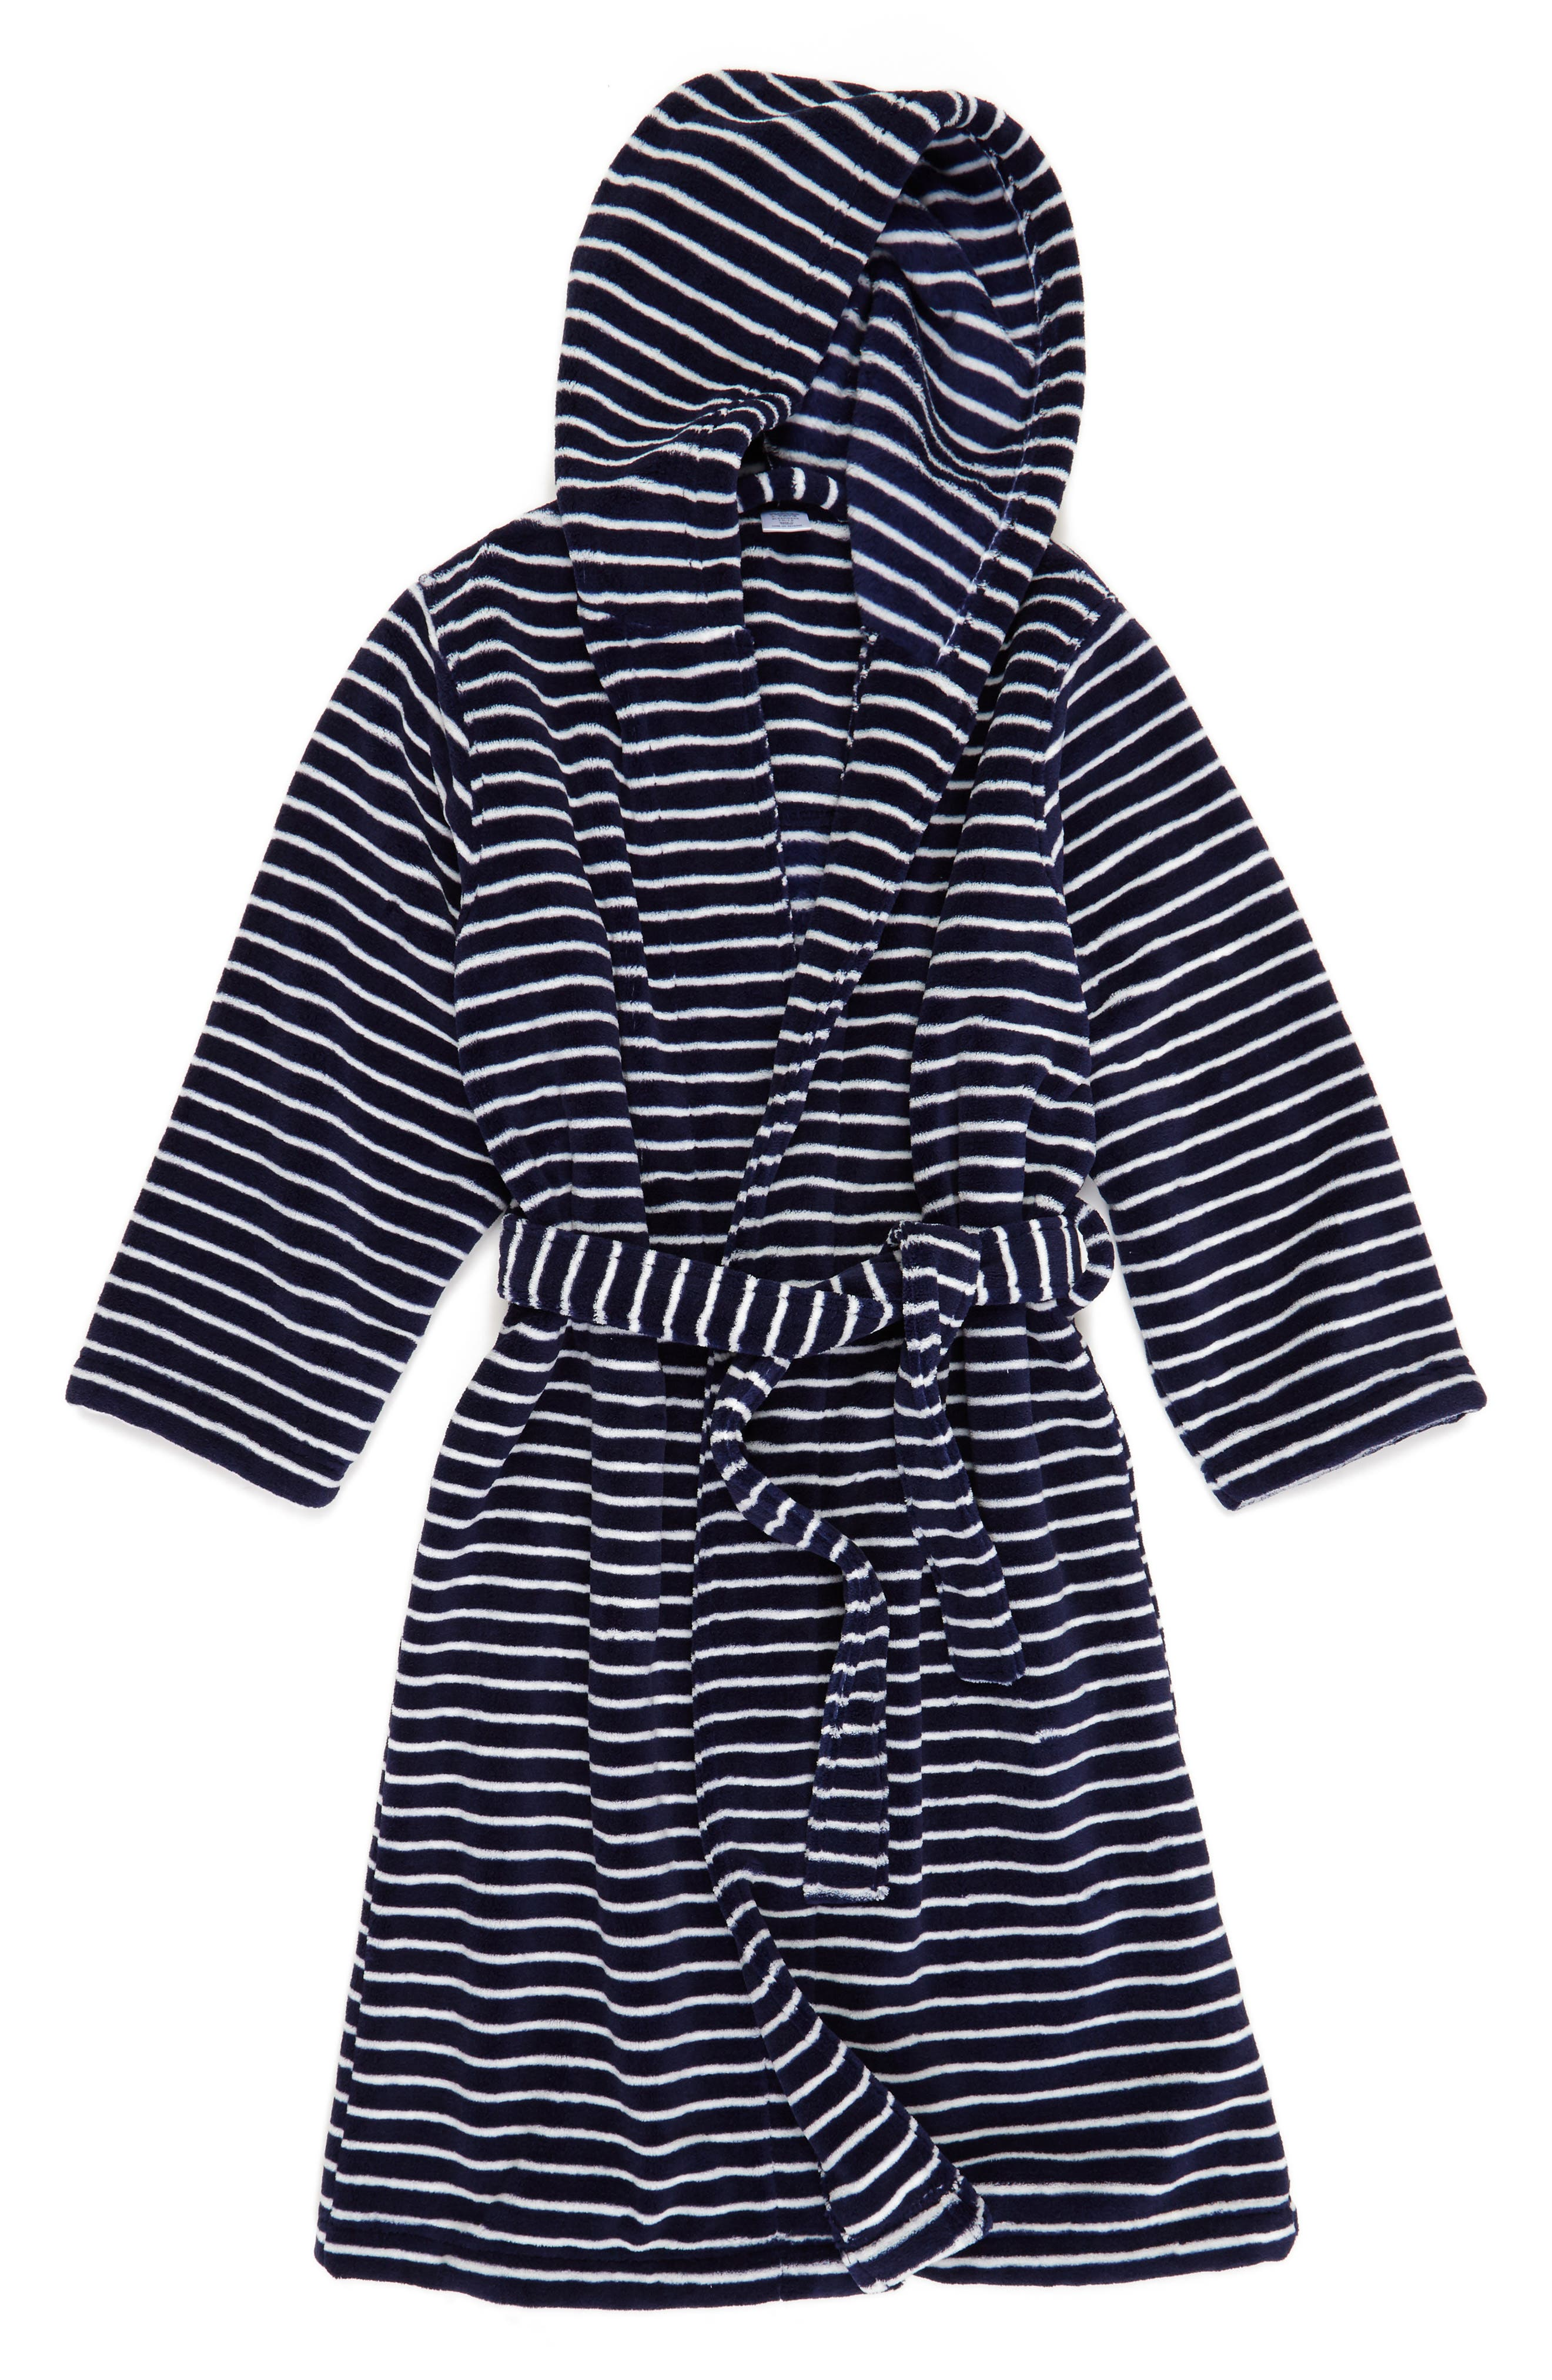 Hooded Plush Robe,                             Main thumbnail 1, color,                             Navy Peacoat- Ivory Stripe